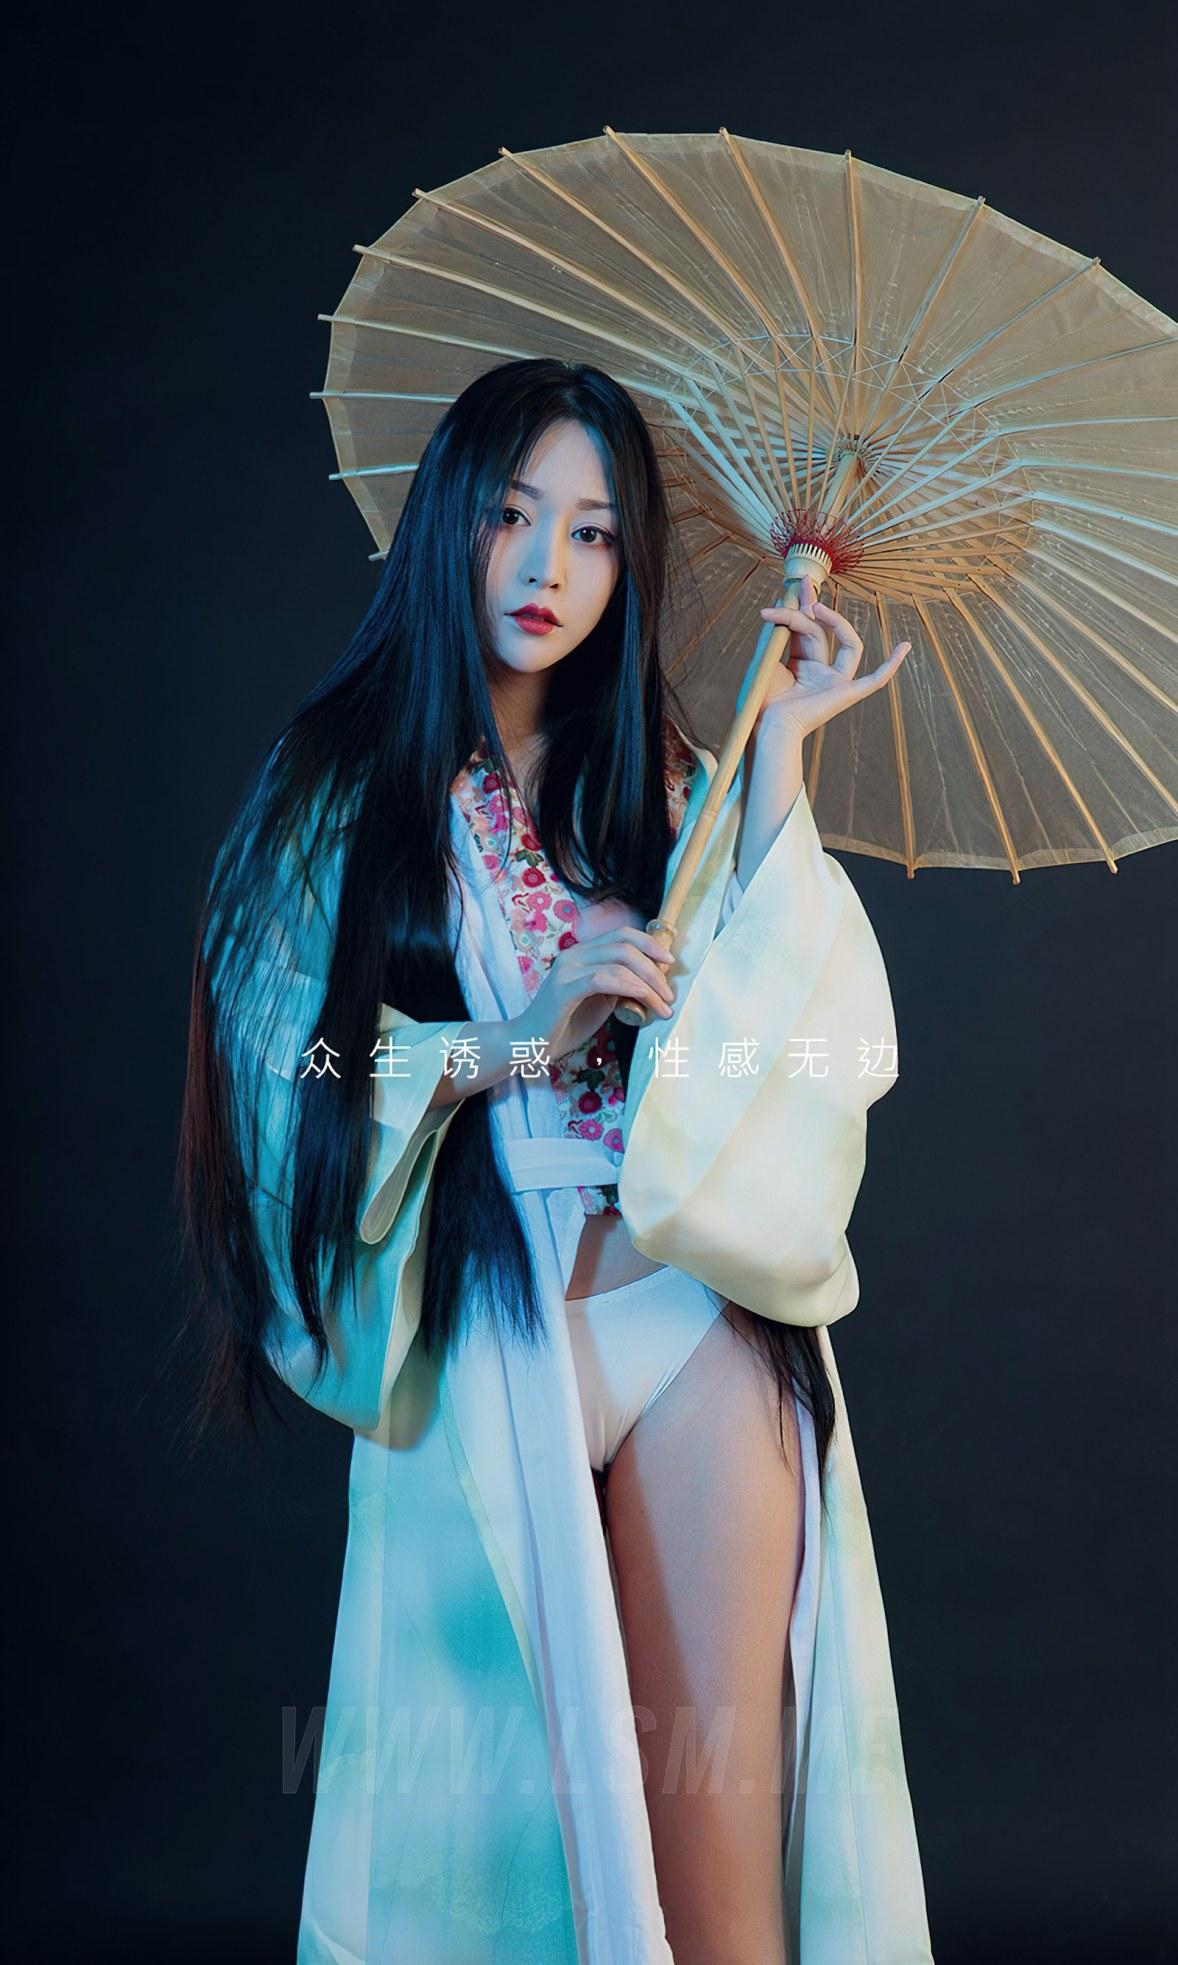 UGirls 爱尤物 No.2128 魅惑众生 模特合辑 - 2